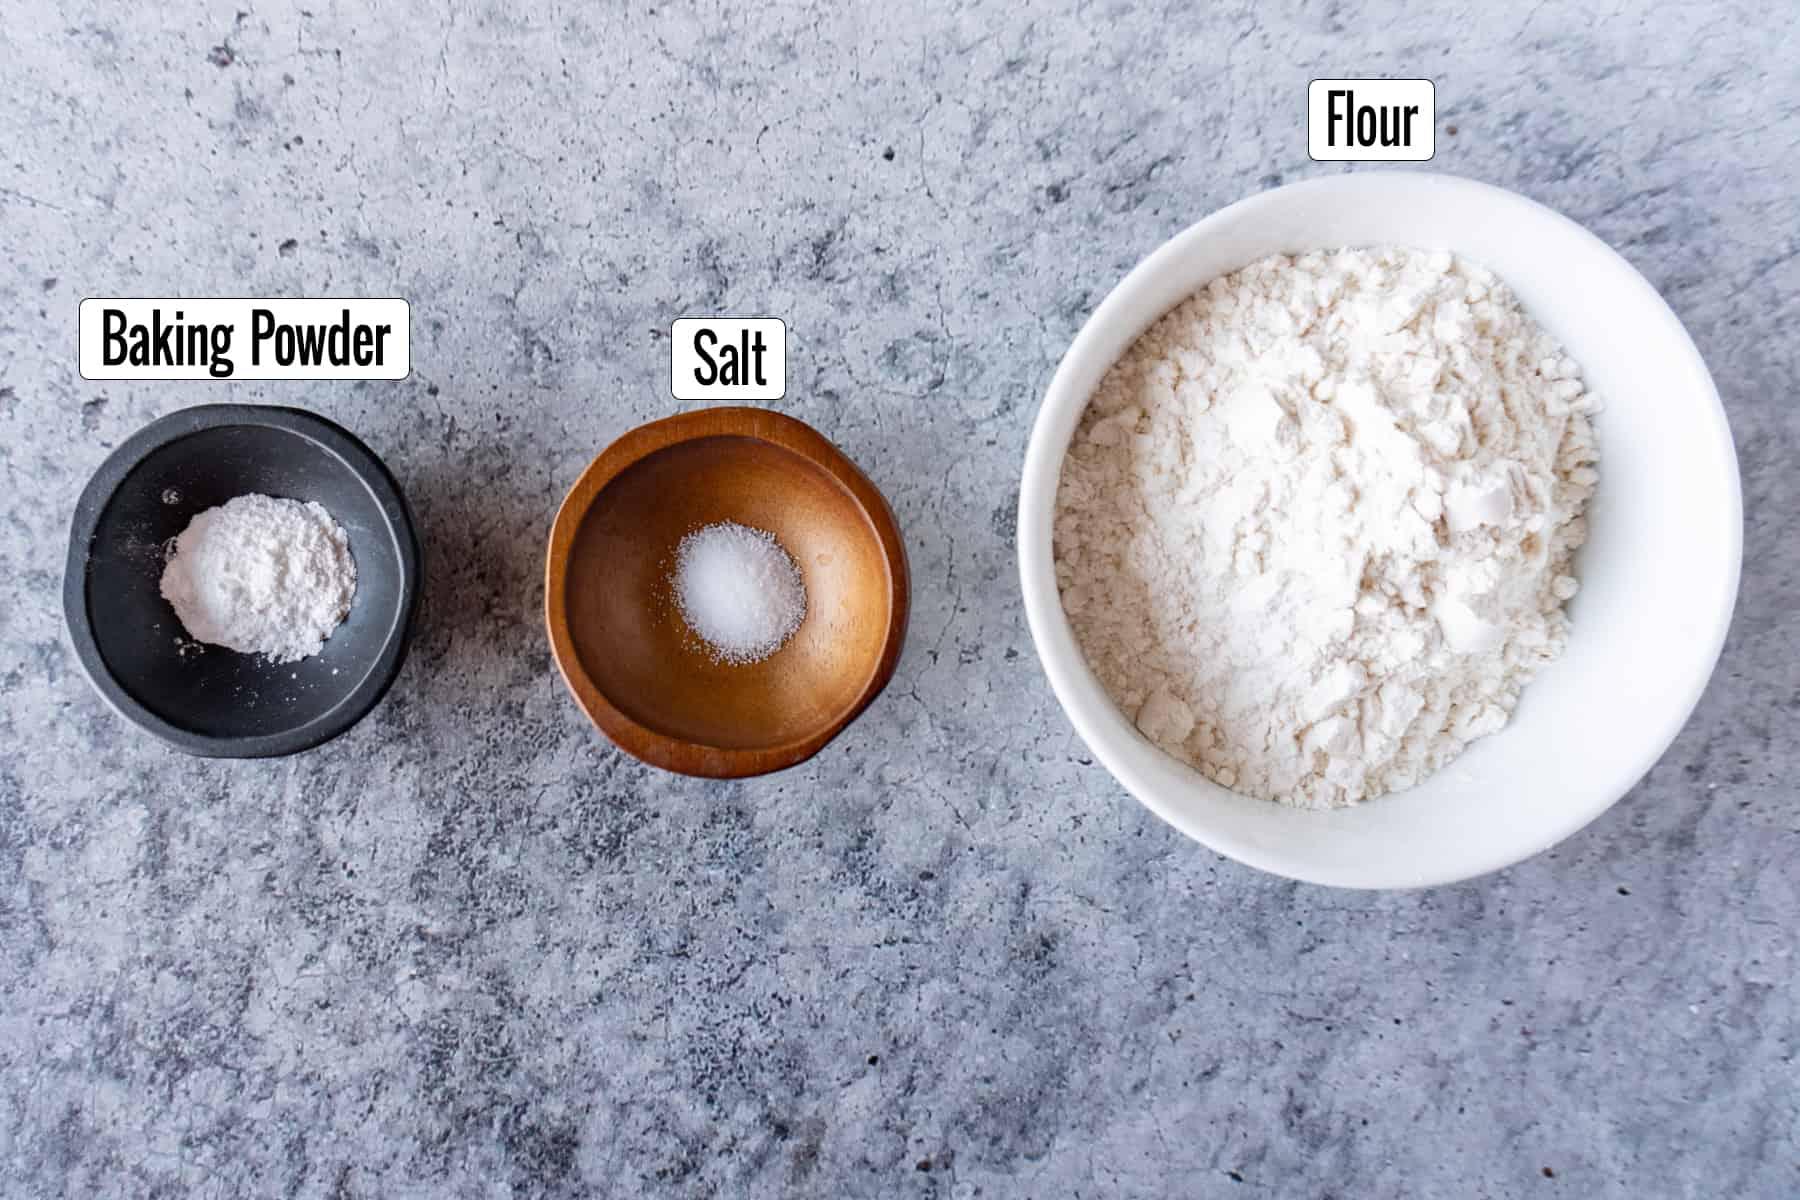 Best Homemade Brownies Recipe Ingredients: baking powder, salt, flour